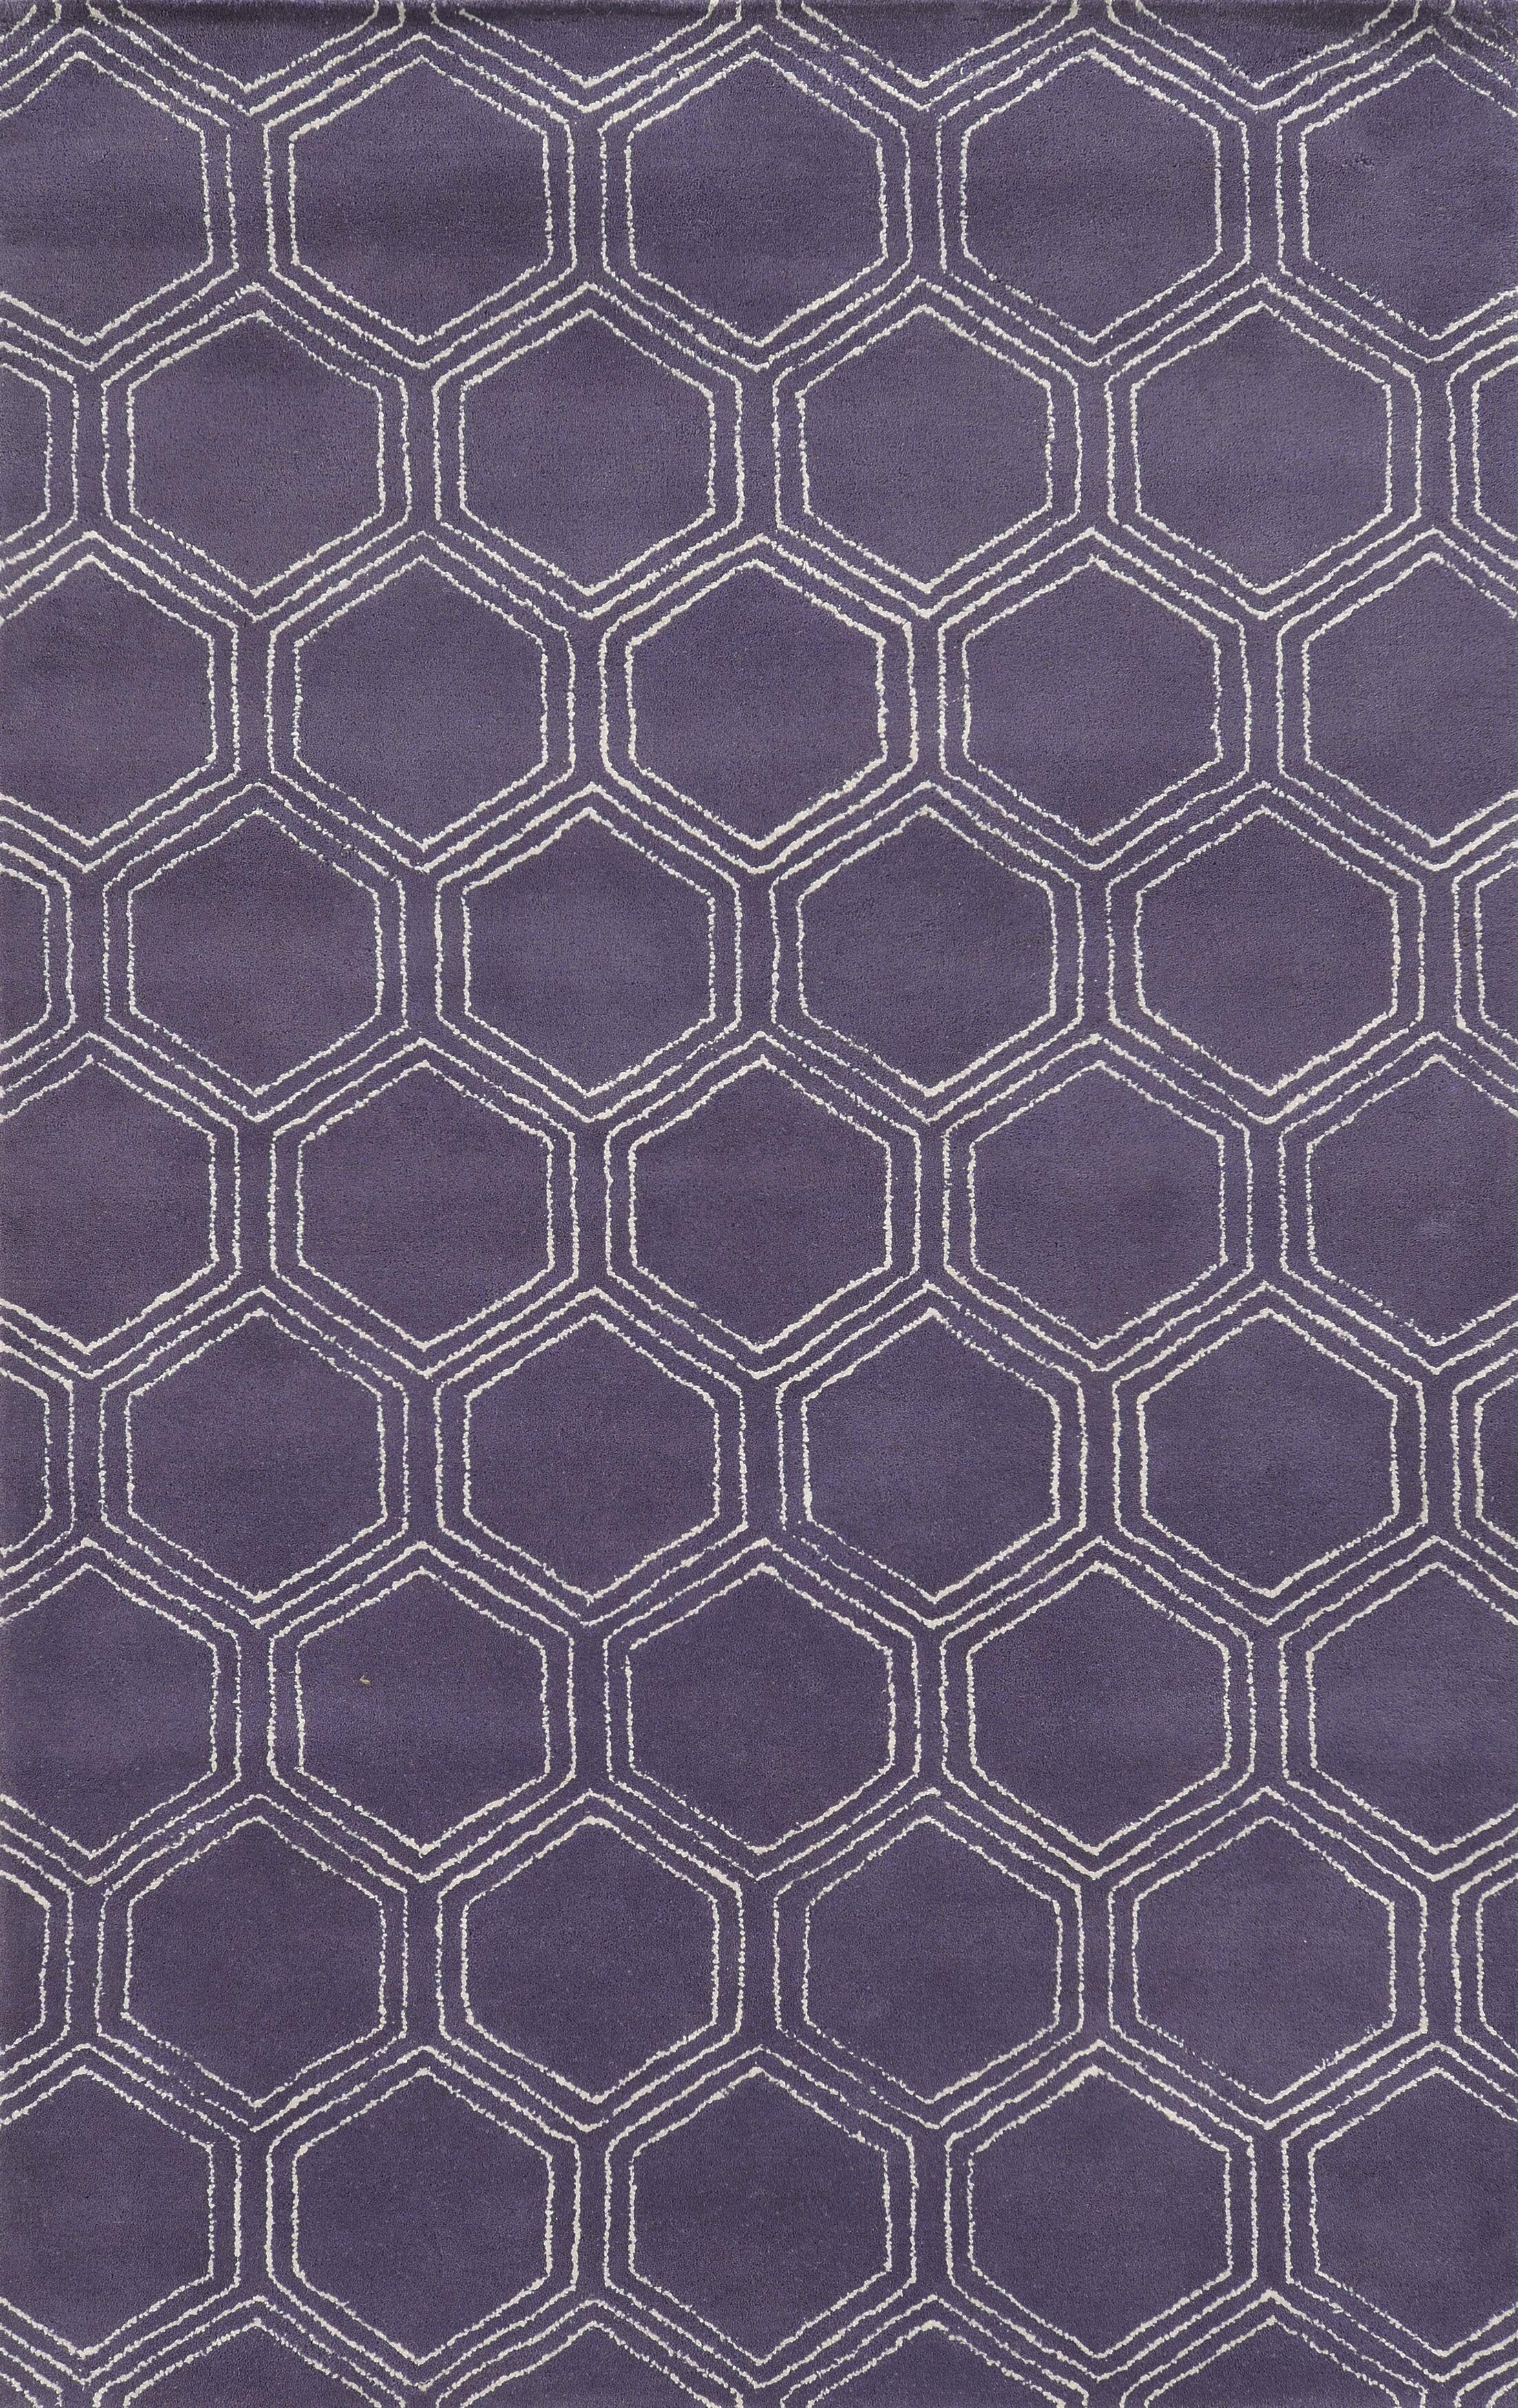 Tamaulipas Hand-Tufted Purple Area Rug Rug Size: Rectangle 9' x 12'